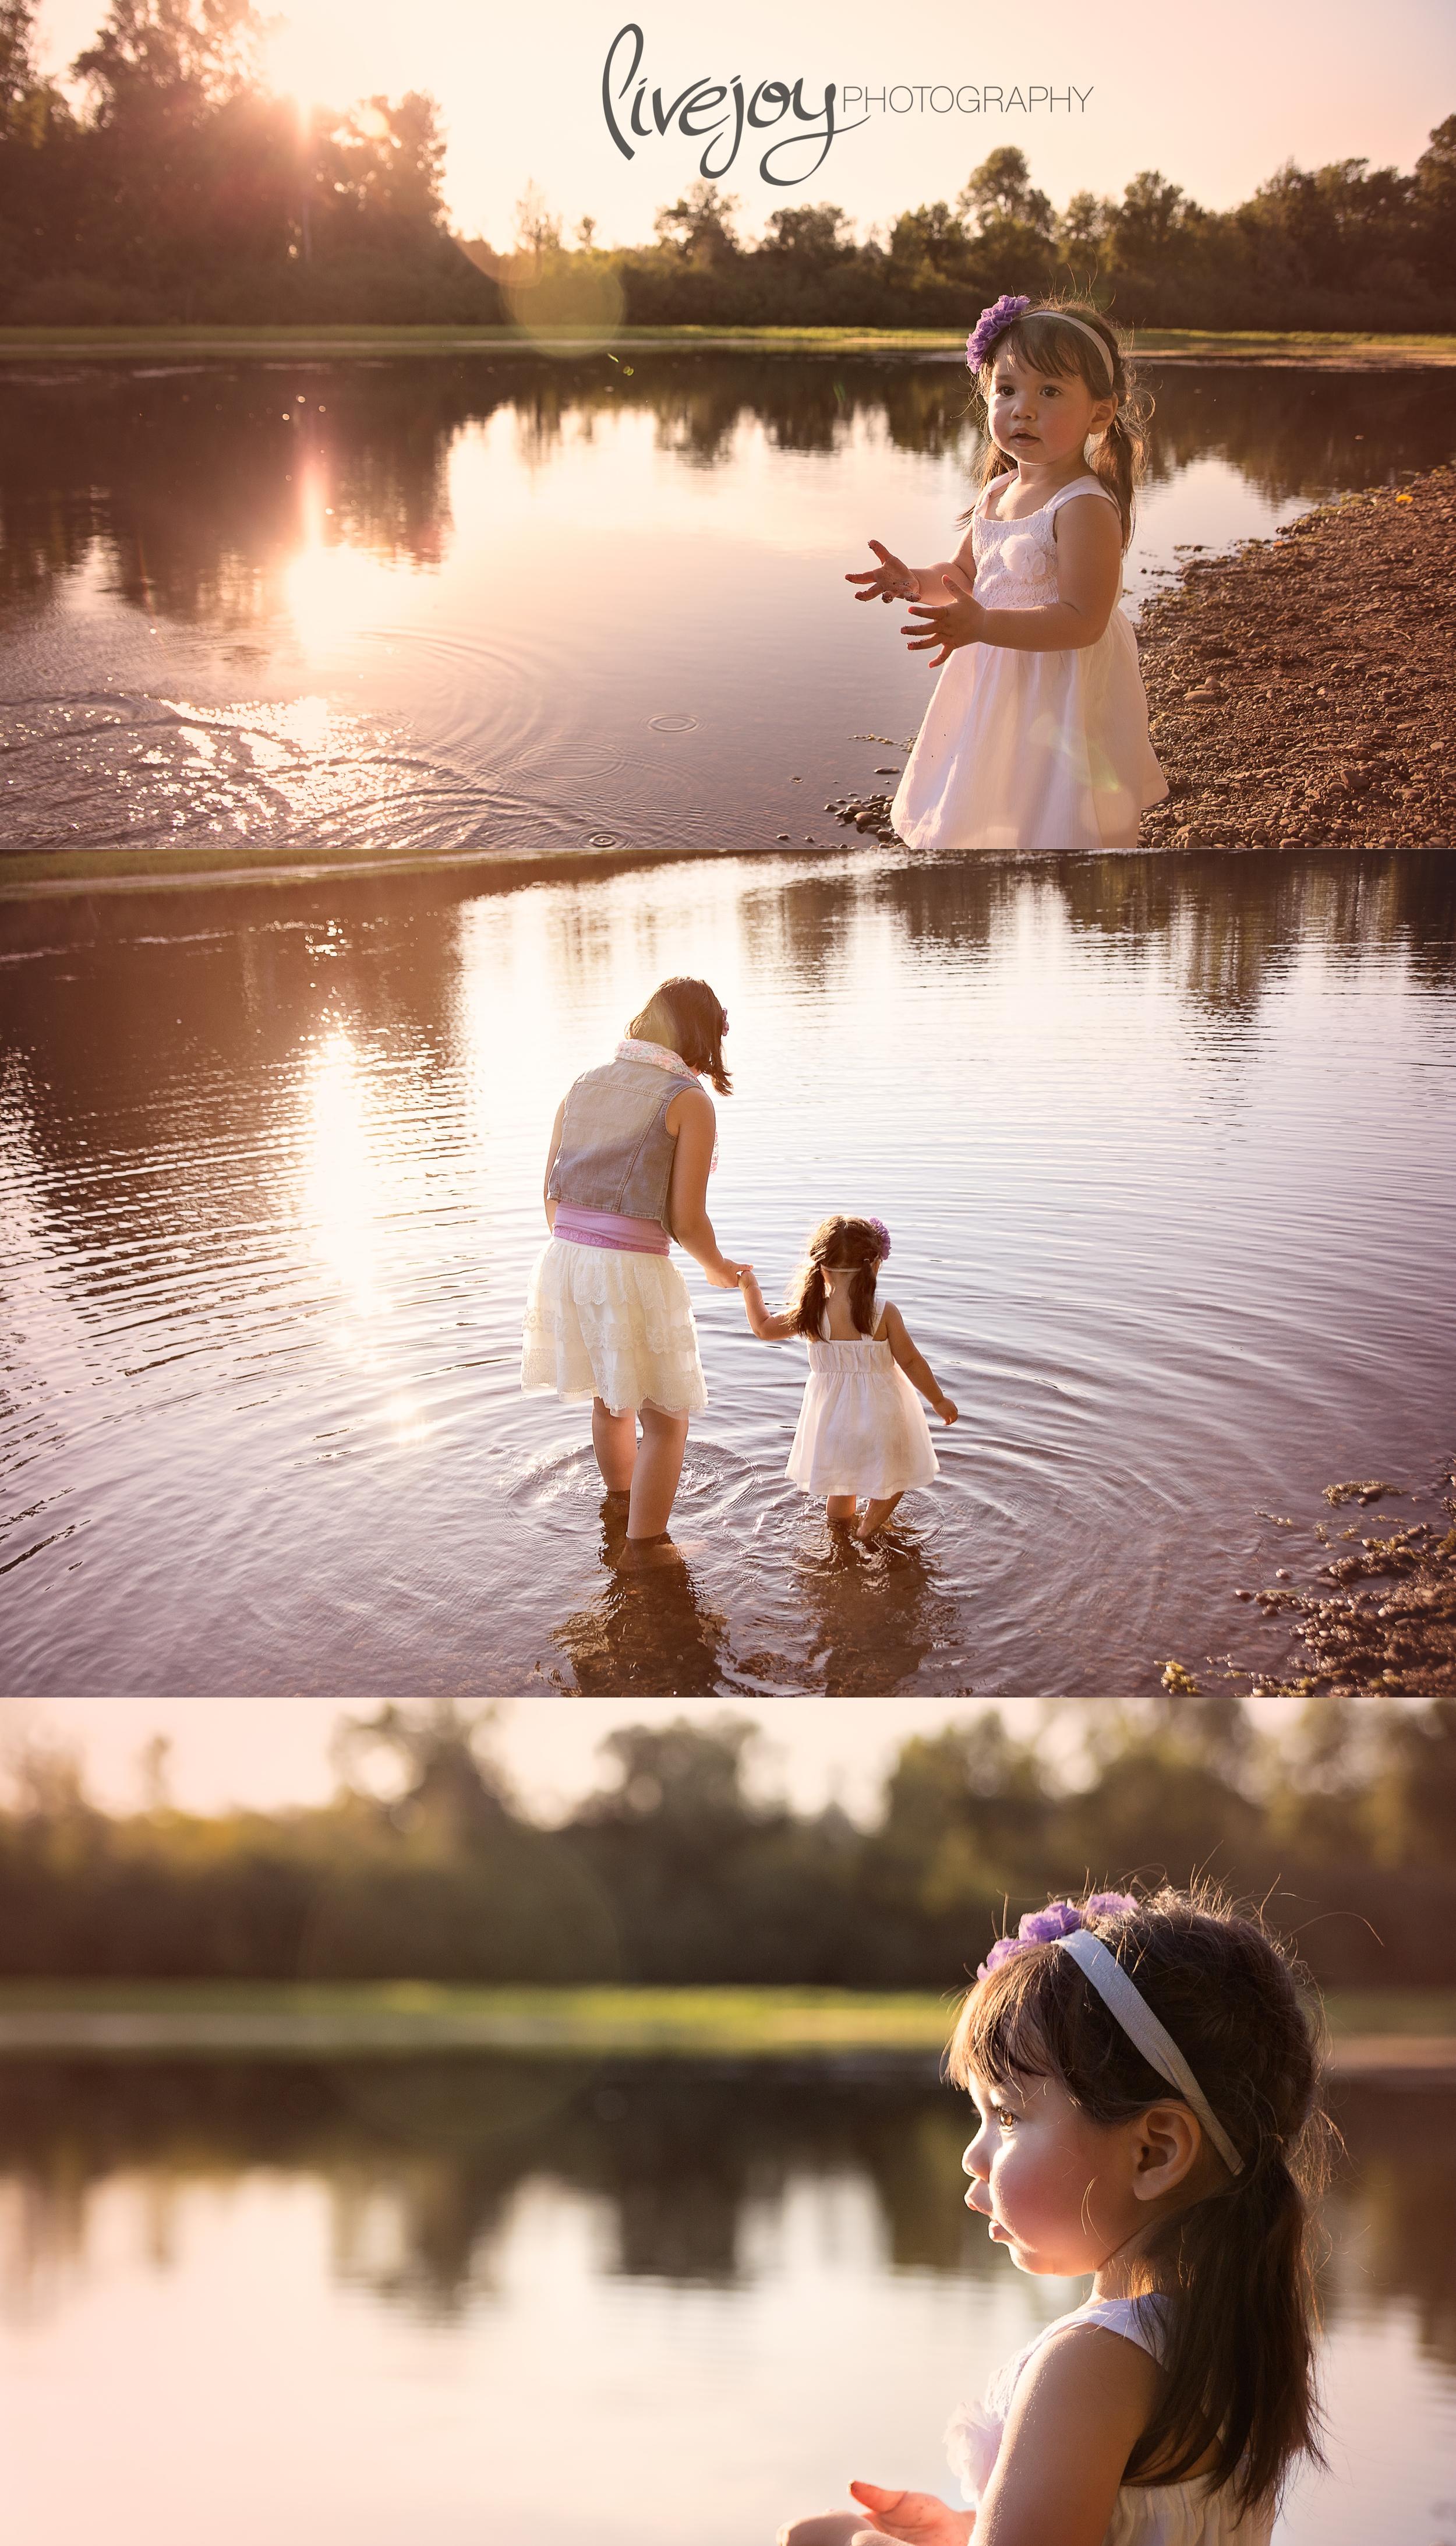 Sibling Session | Oregon | LiveJoy Photography